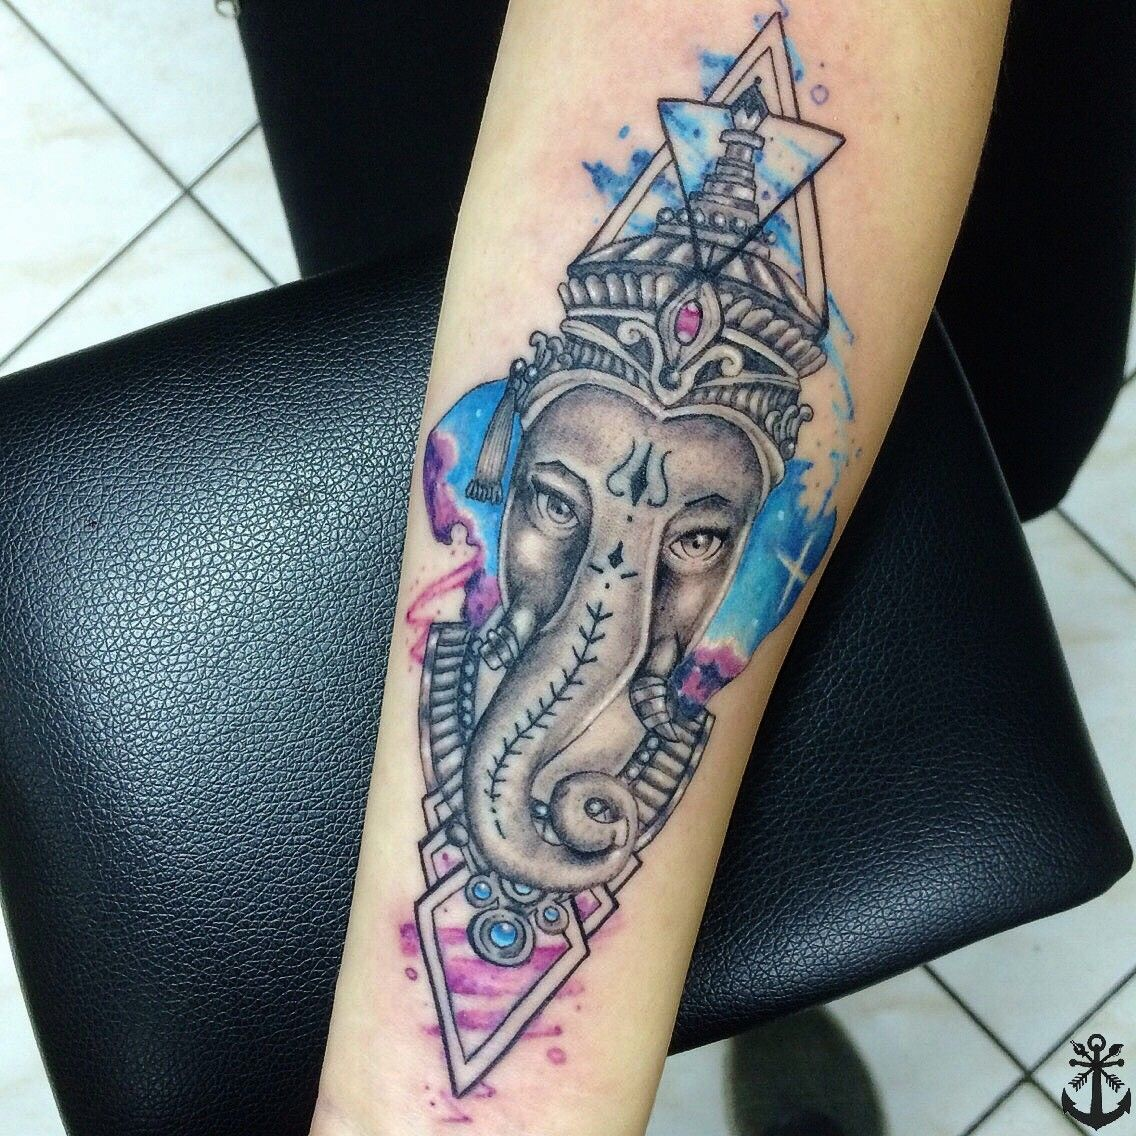 Tattoo Designs Ganapati: Galactic Ganesha Tattoo / Ganesha Tattoo / Ganesha Tatuaje